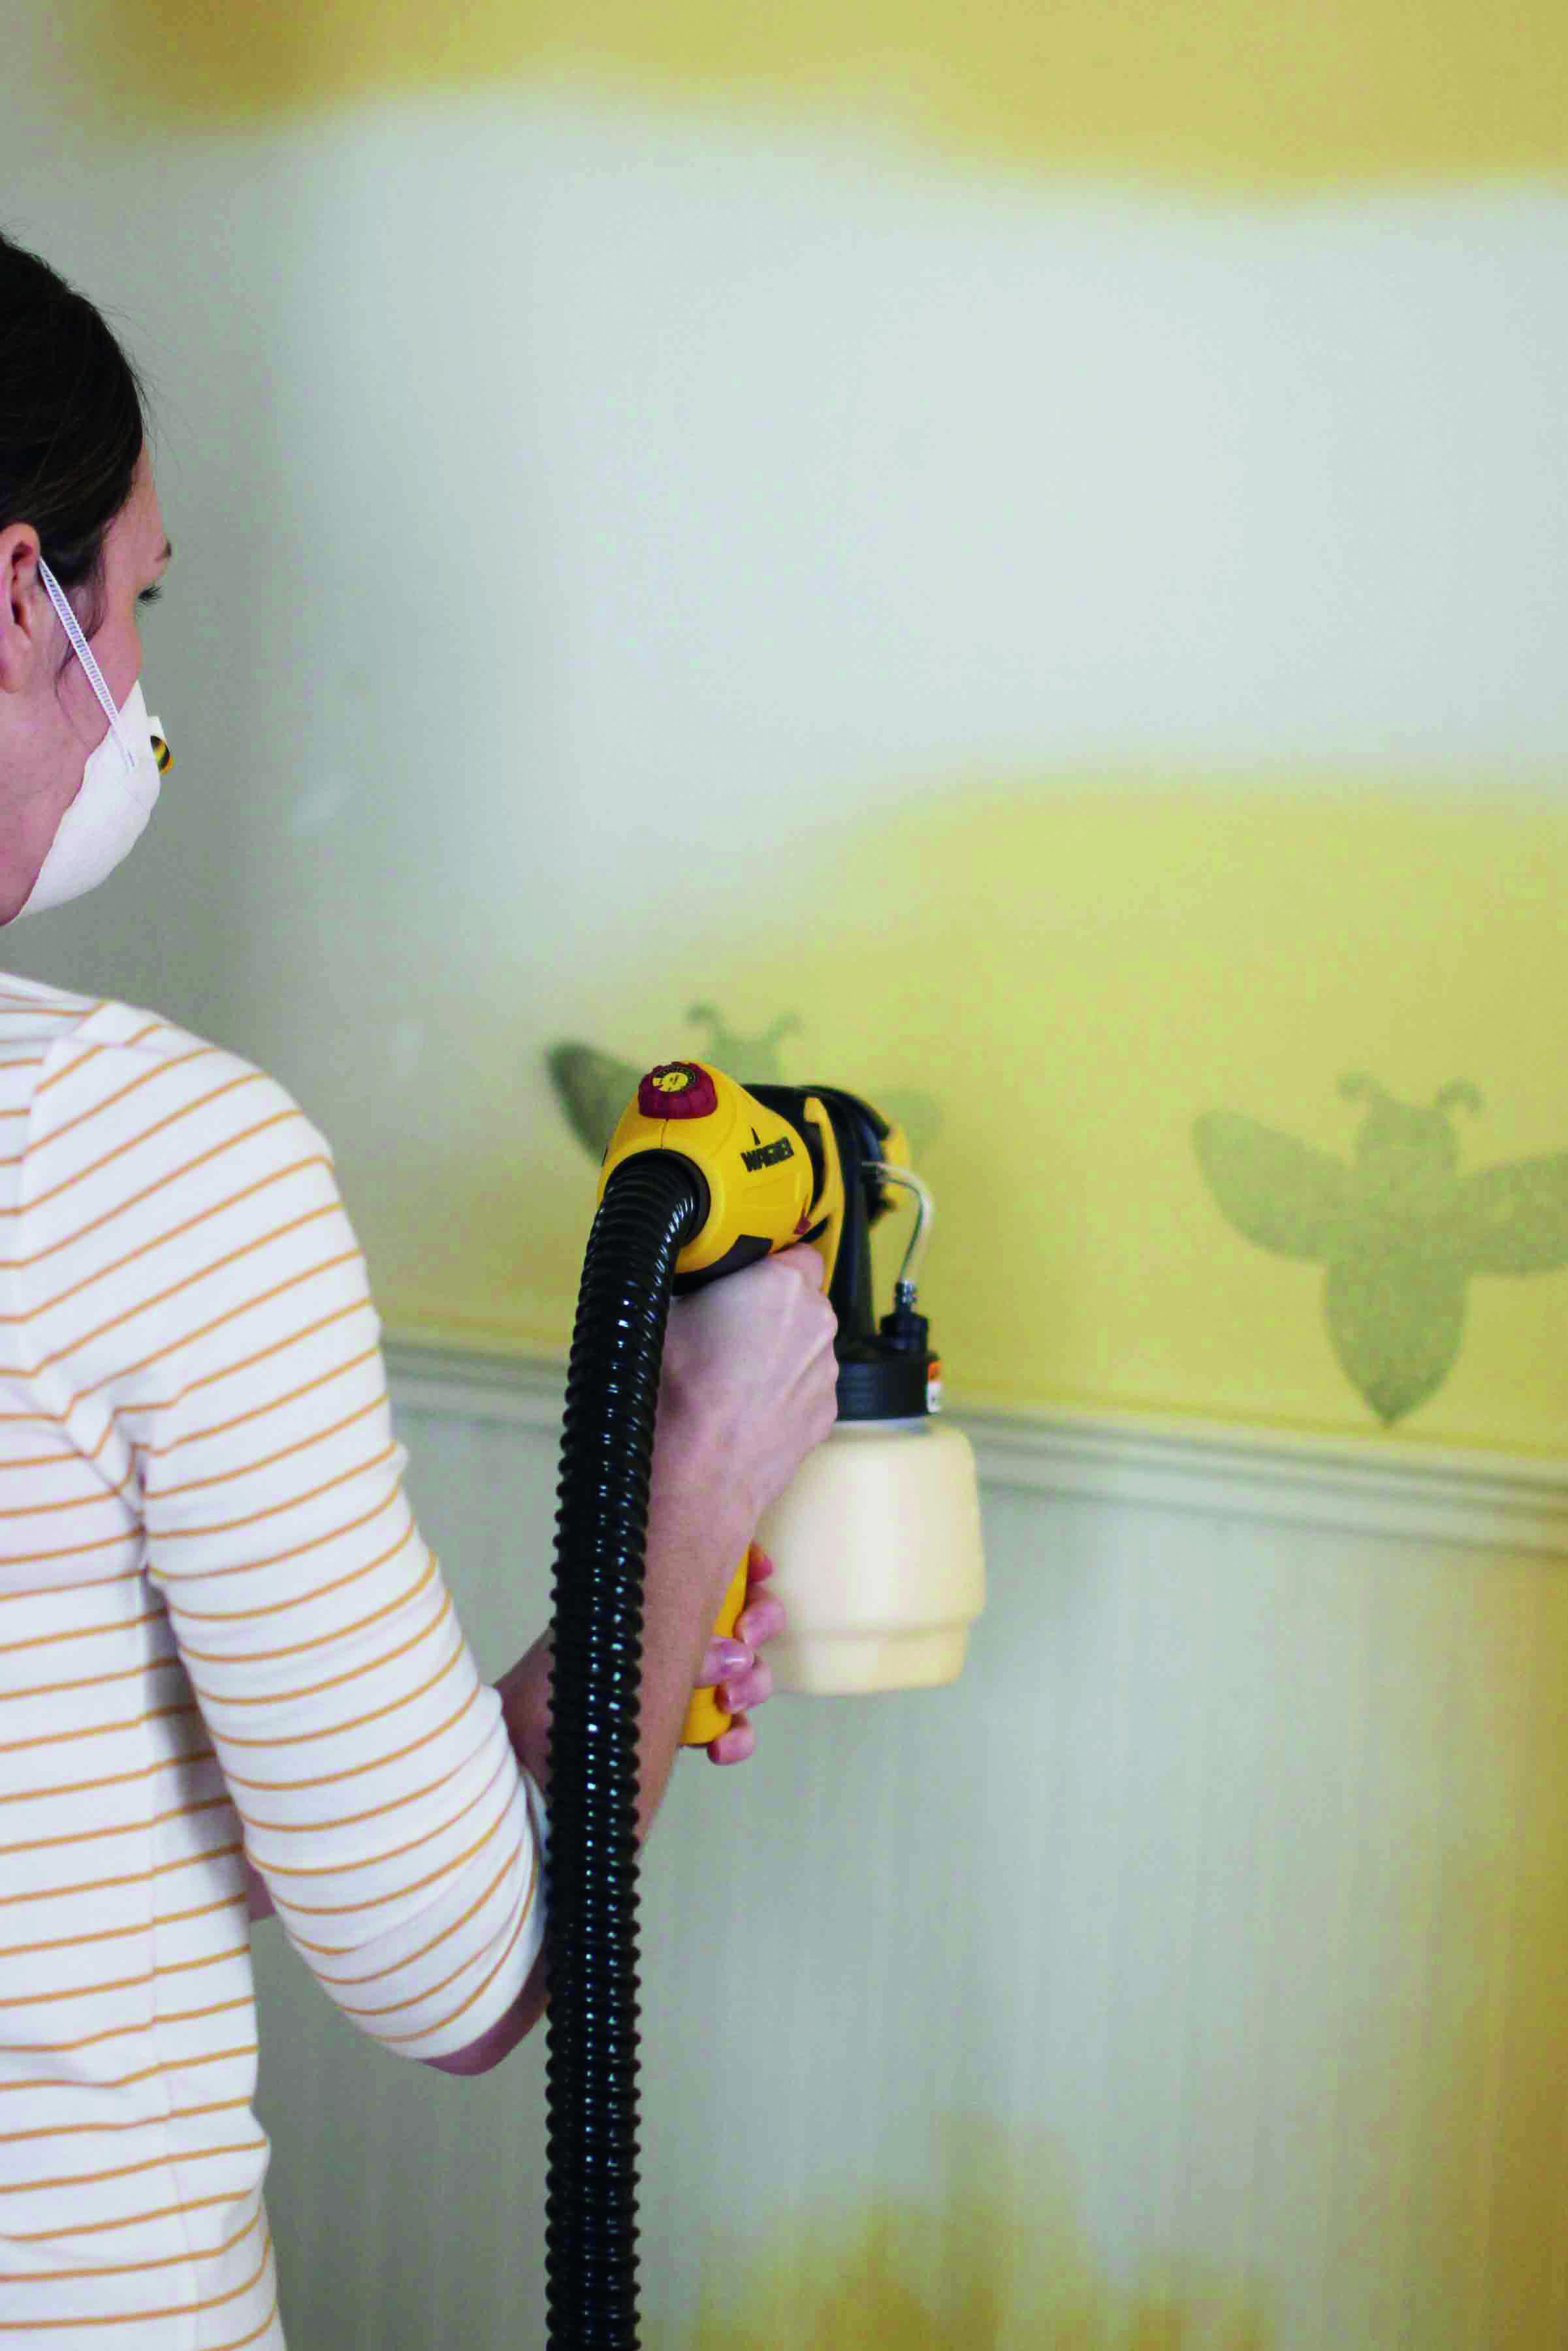 Wall spraying bee template